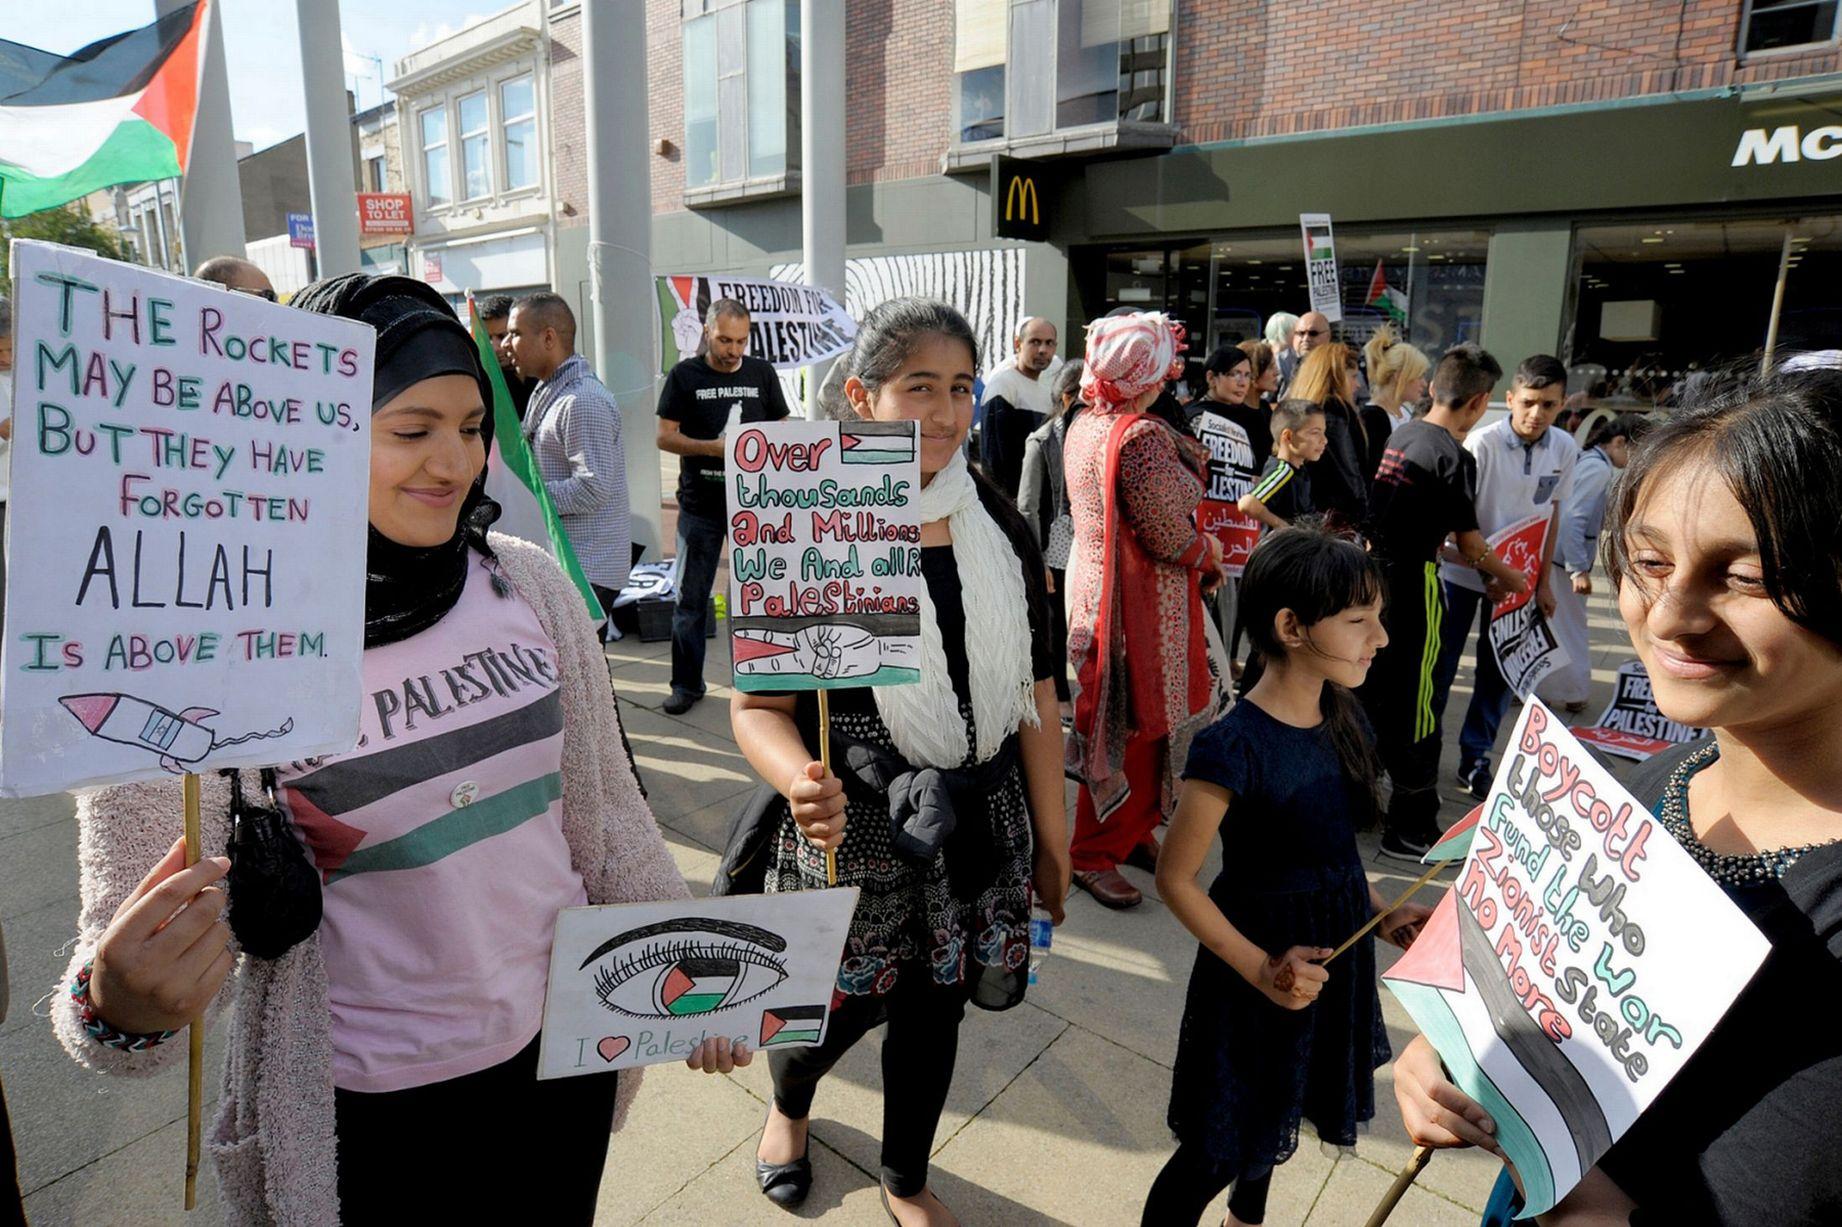 Palestine Solidarity vigil in Middlesbrough